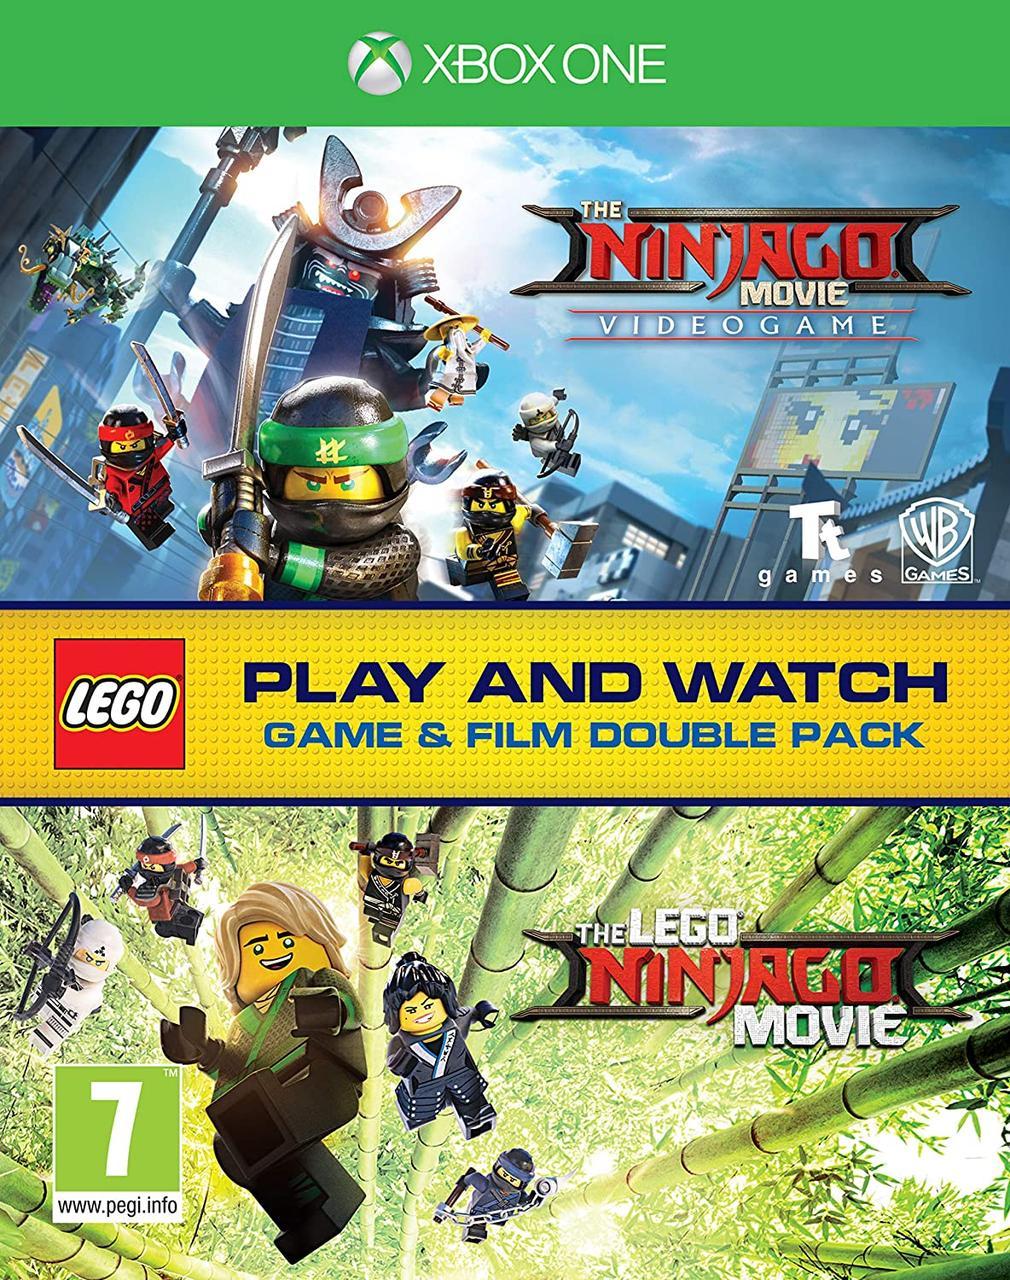 Lego Ninjago Game & Film Double Pack XBox One (російські субтитри)